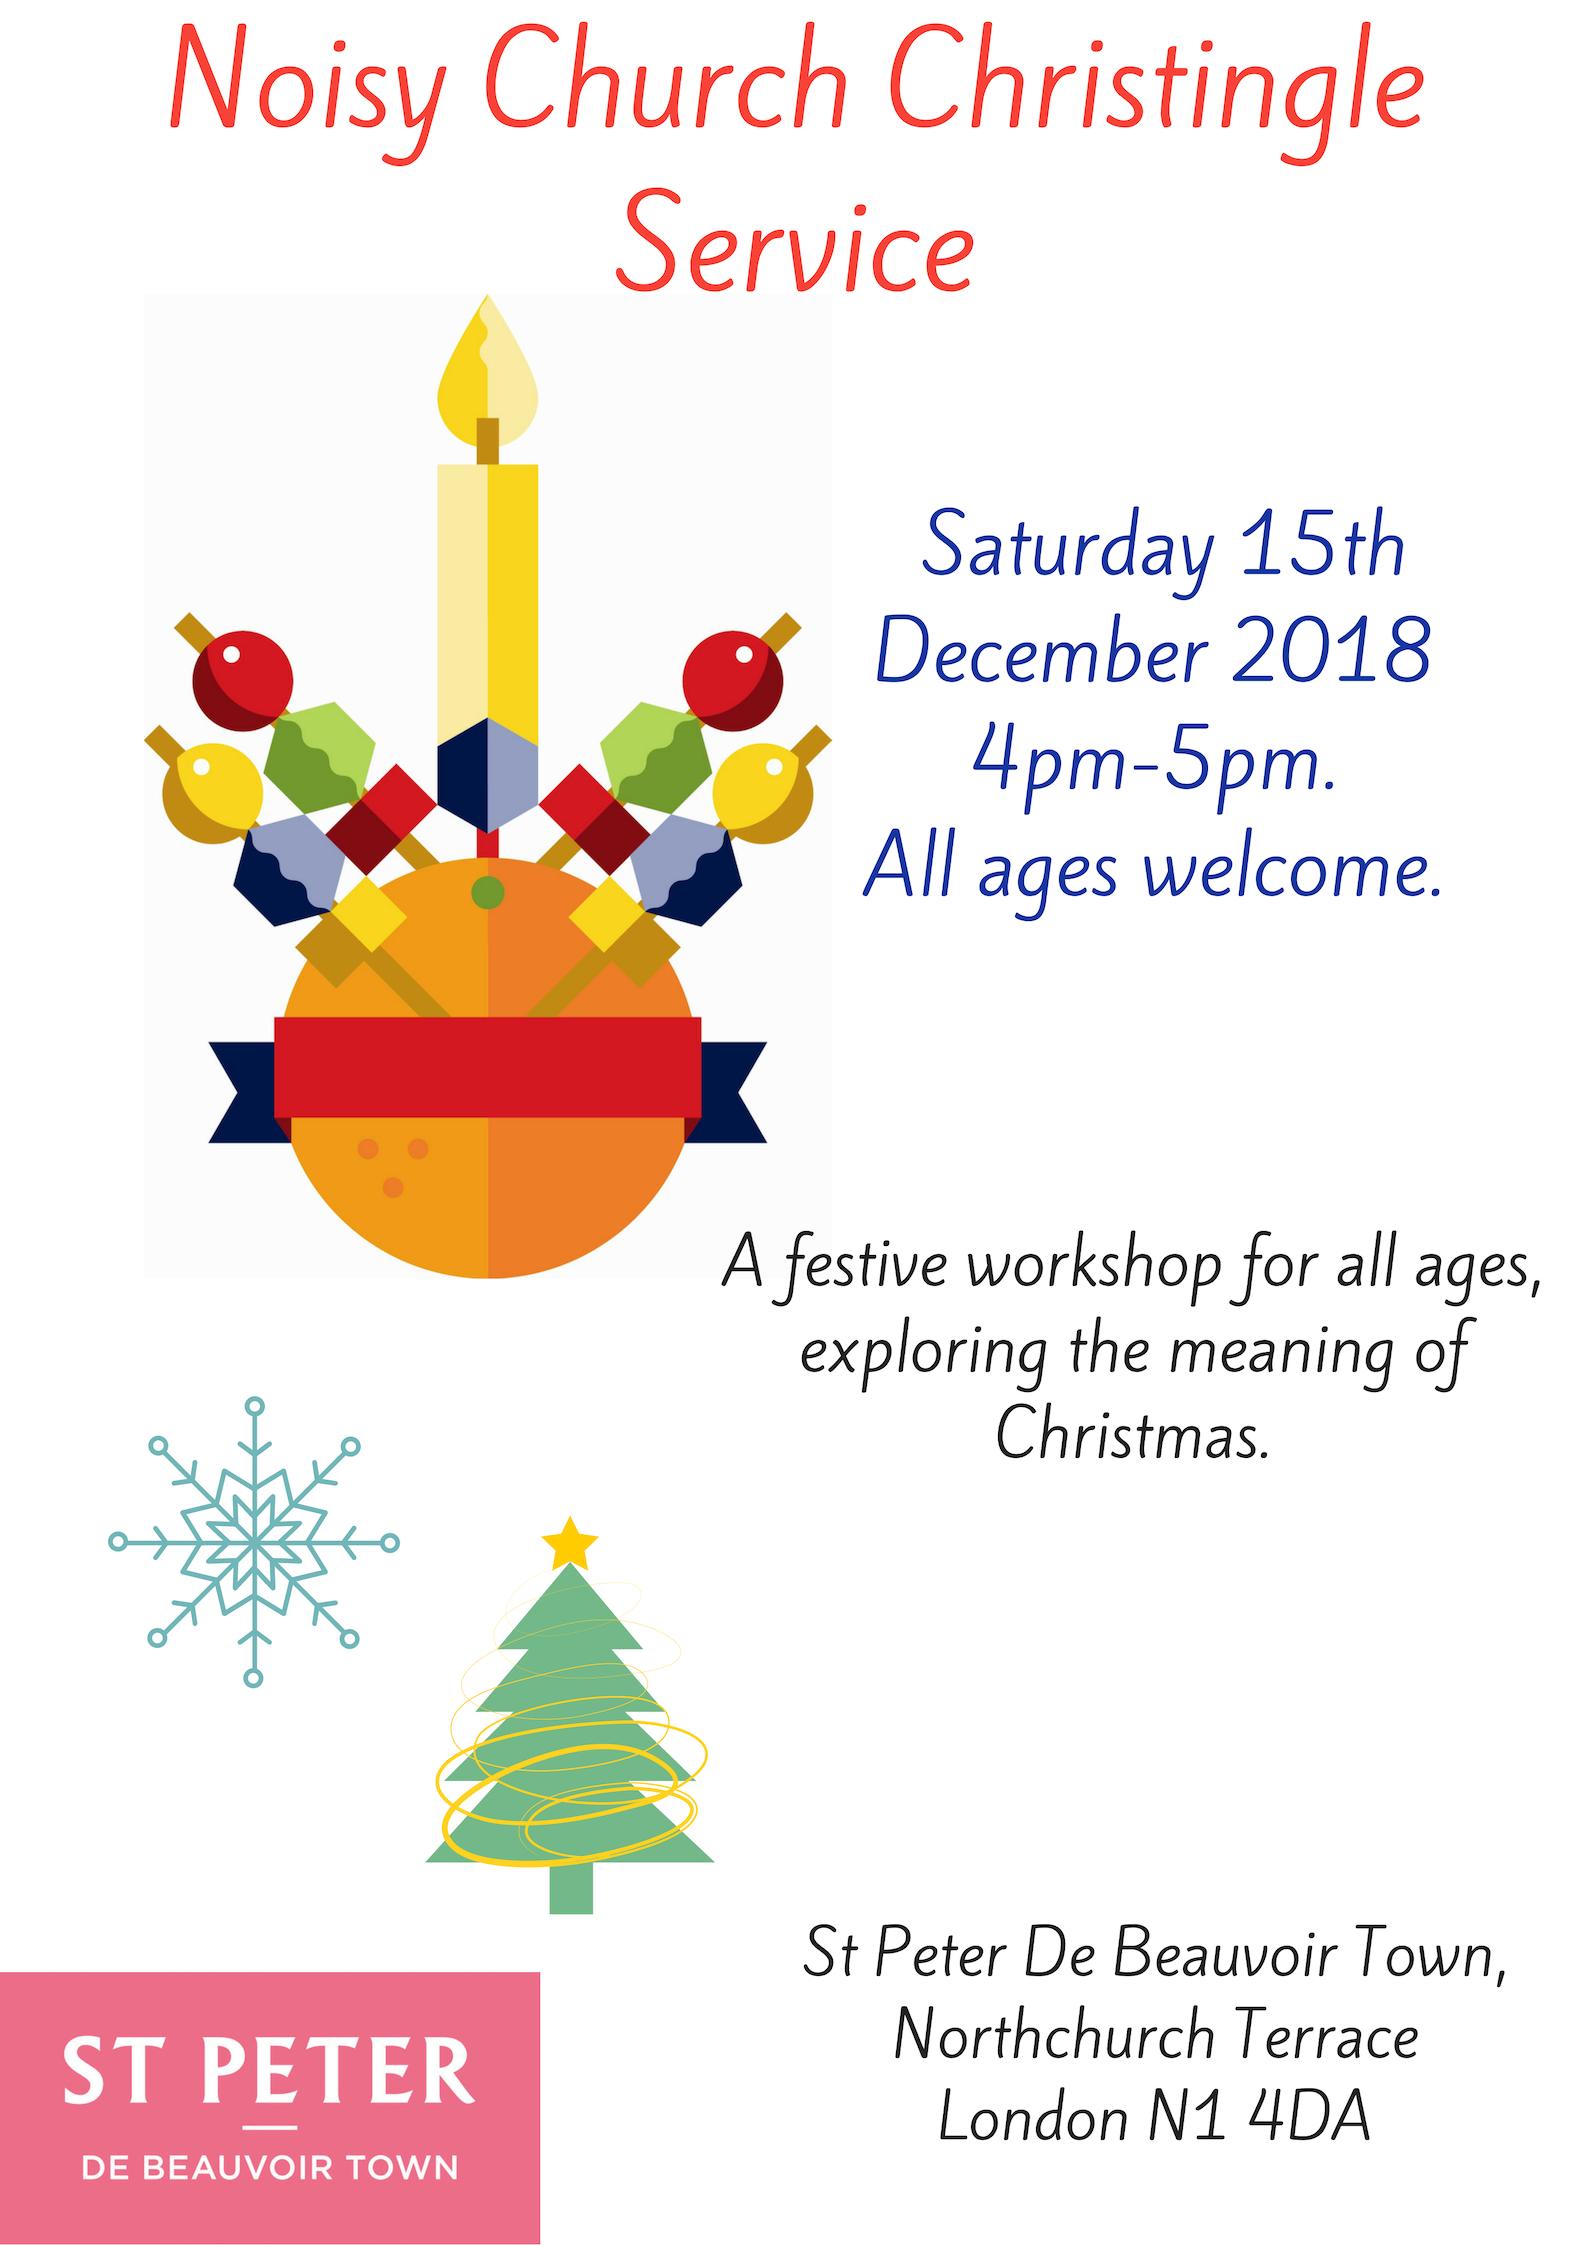 Noisy Church Christingle Poster